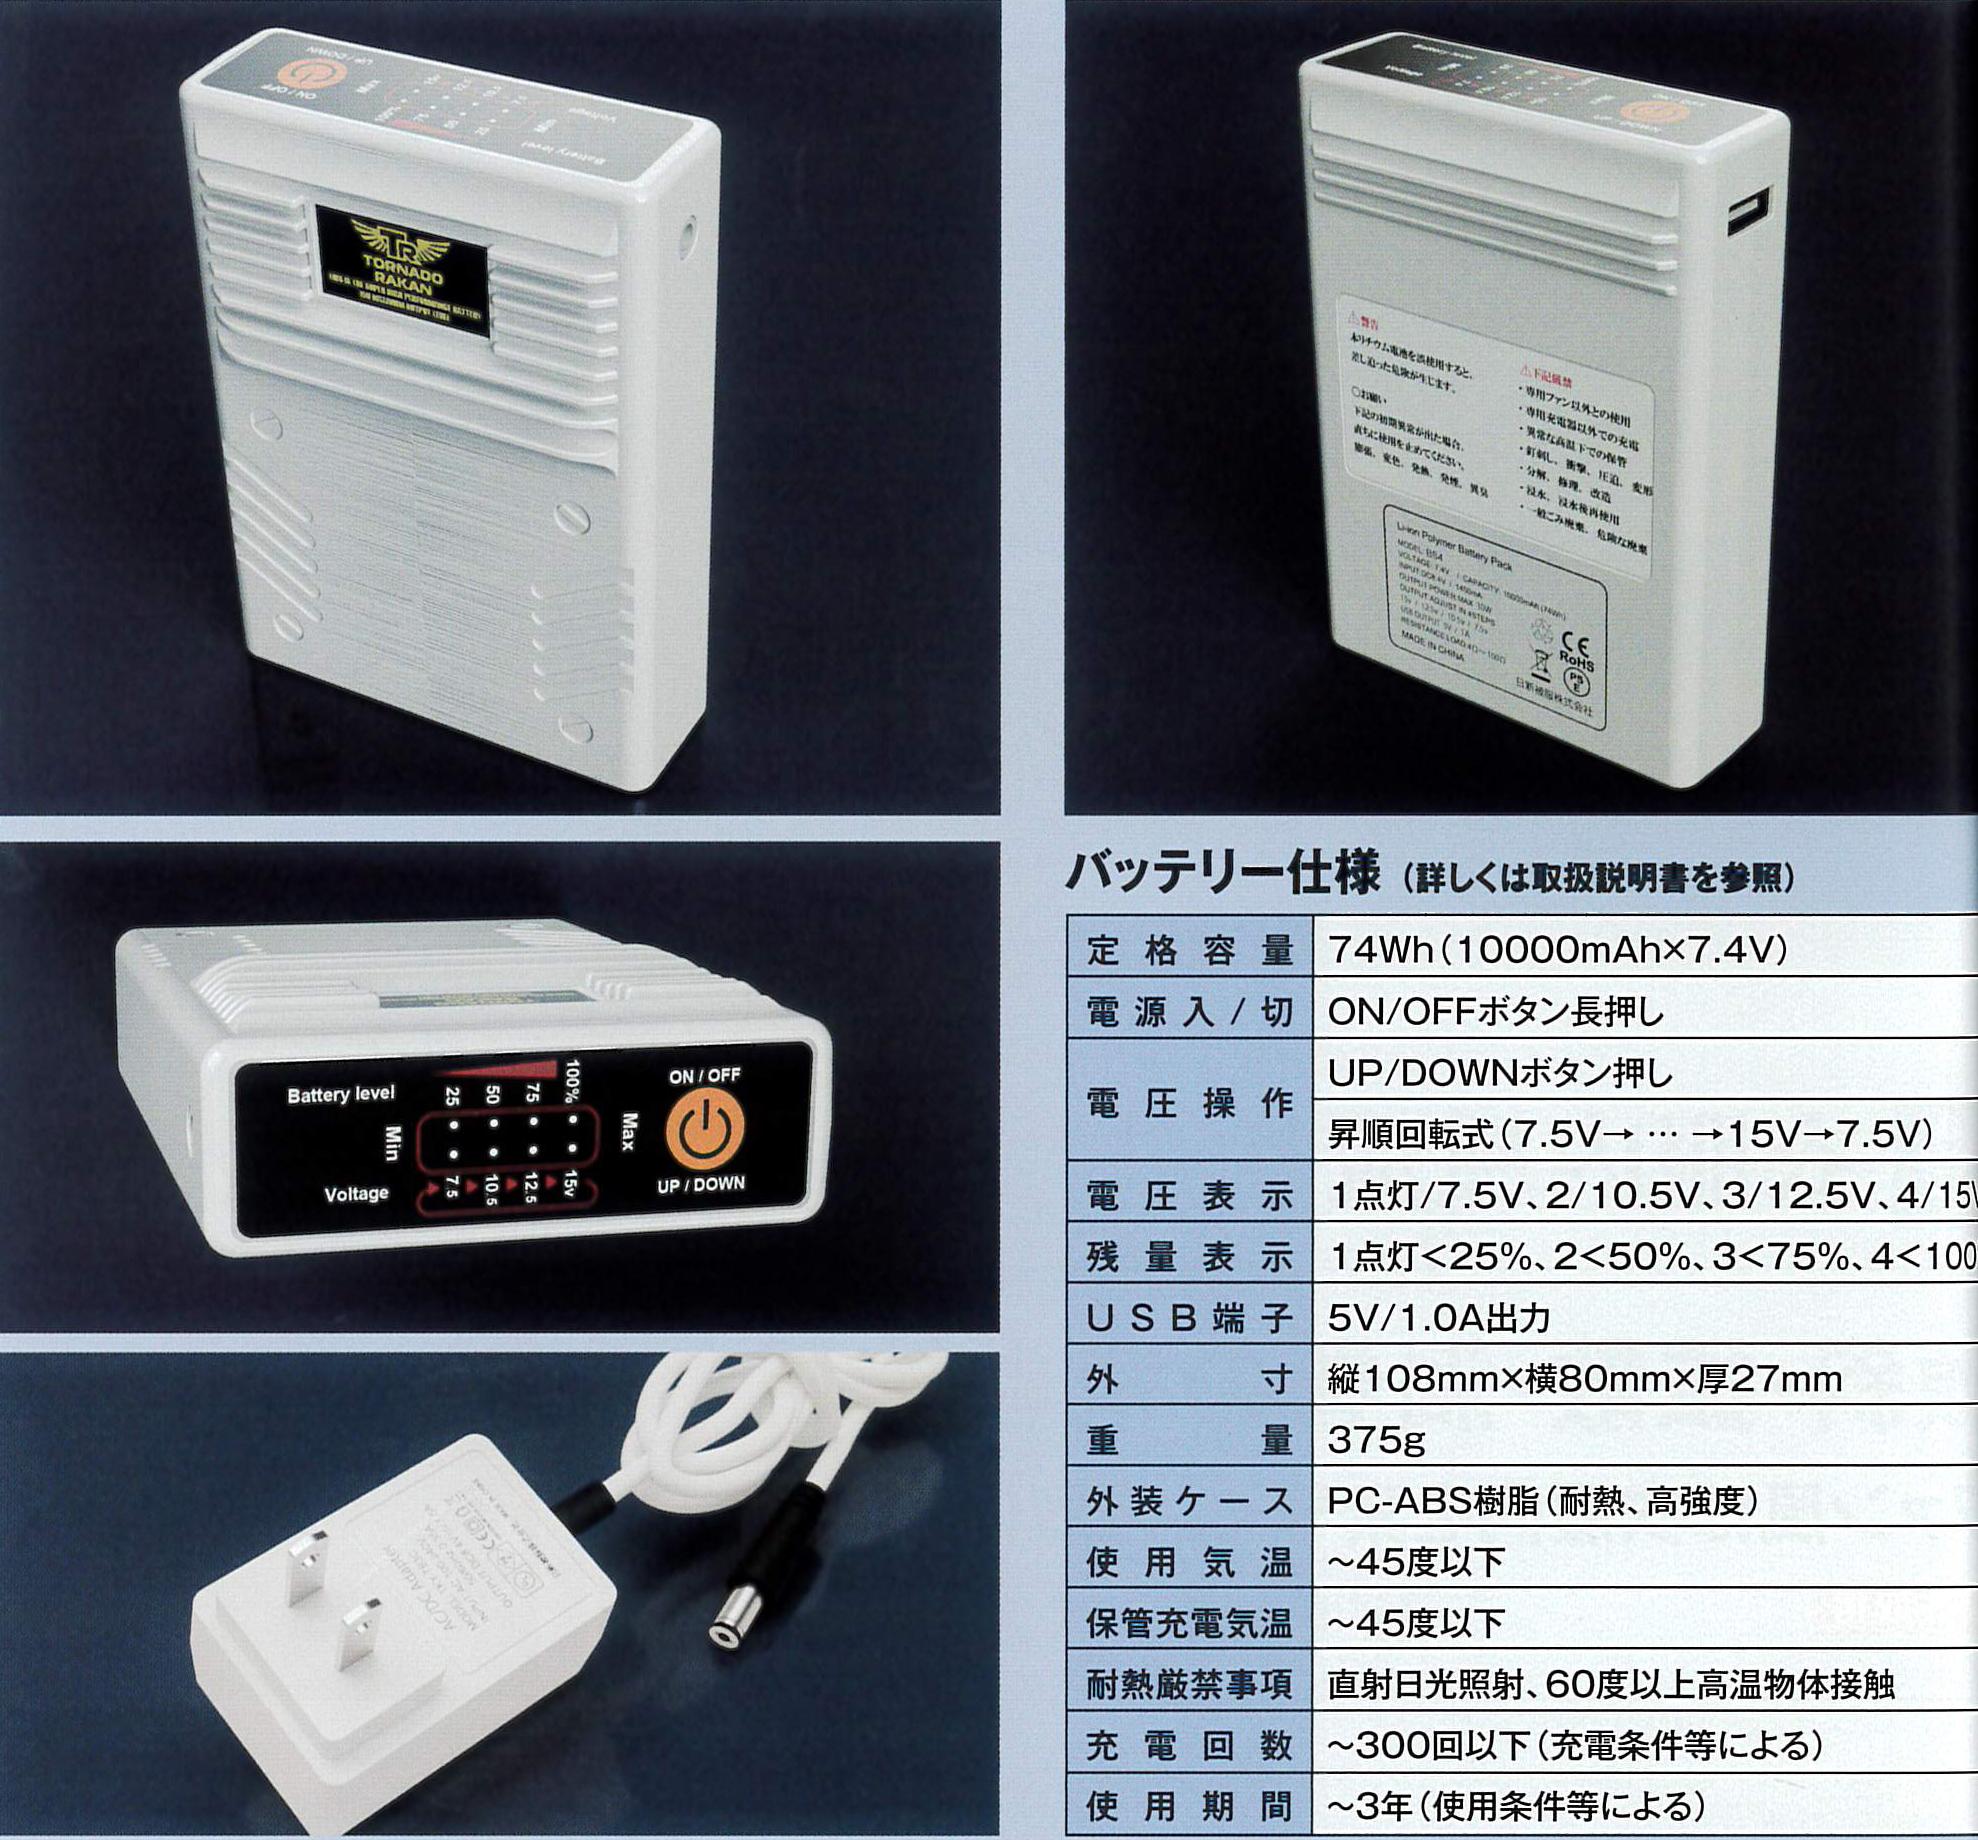 TORNADO RAKAN~BS4-500/FS3-500 空調機器 ¥17,840(税込)~